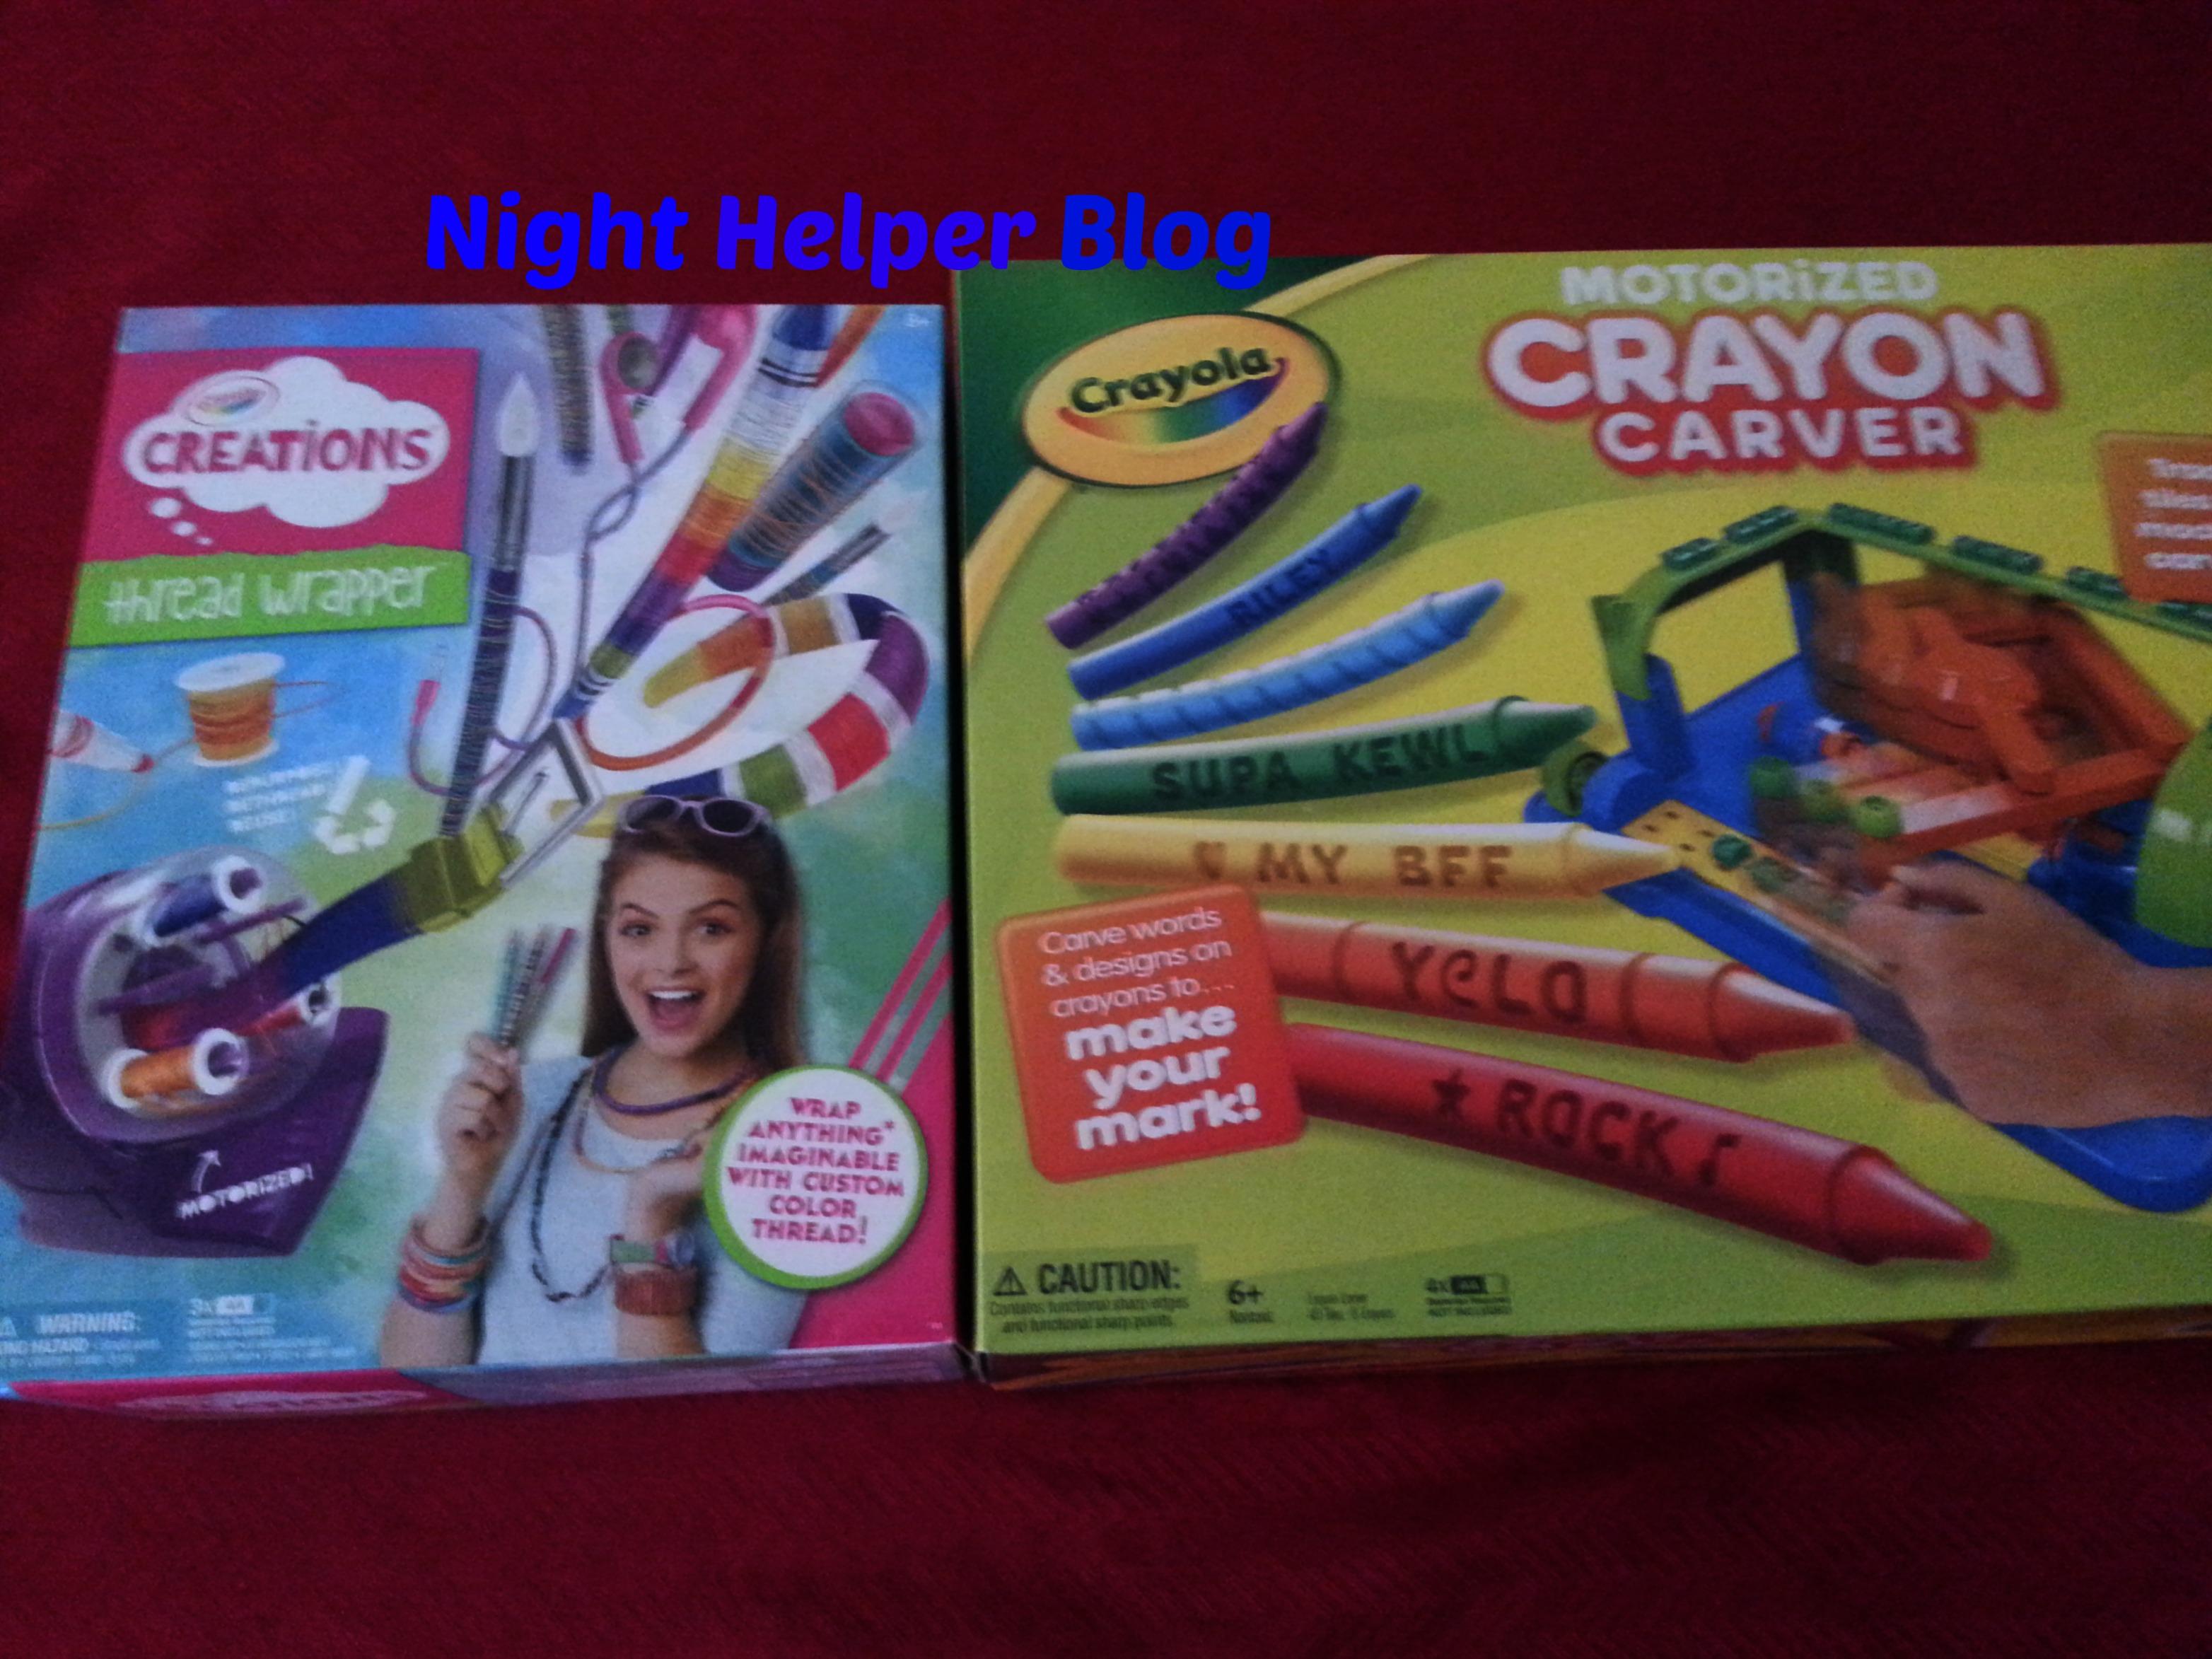 crayons111111